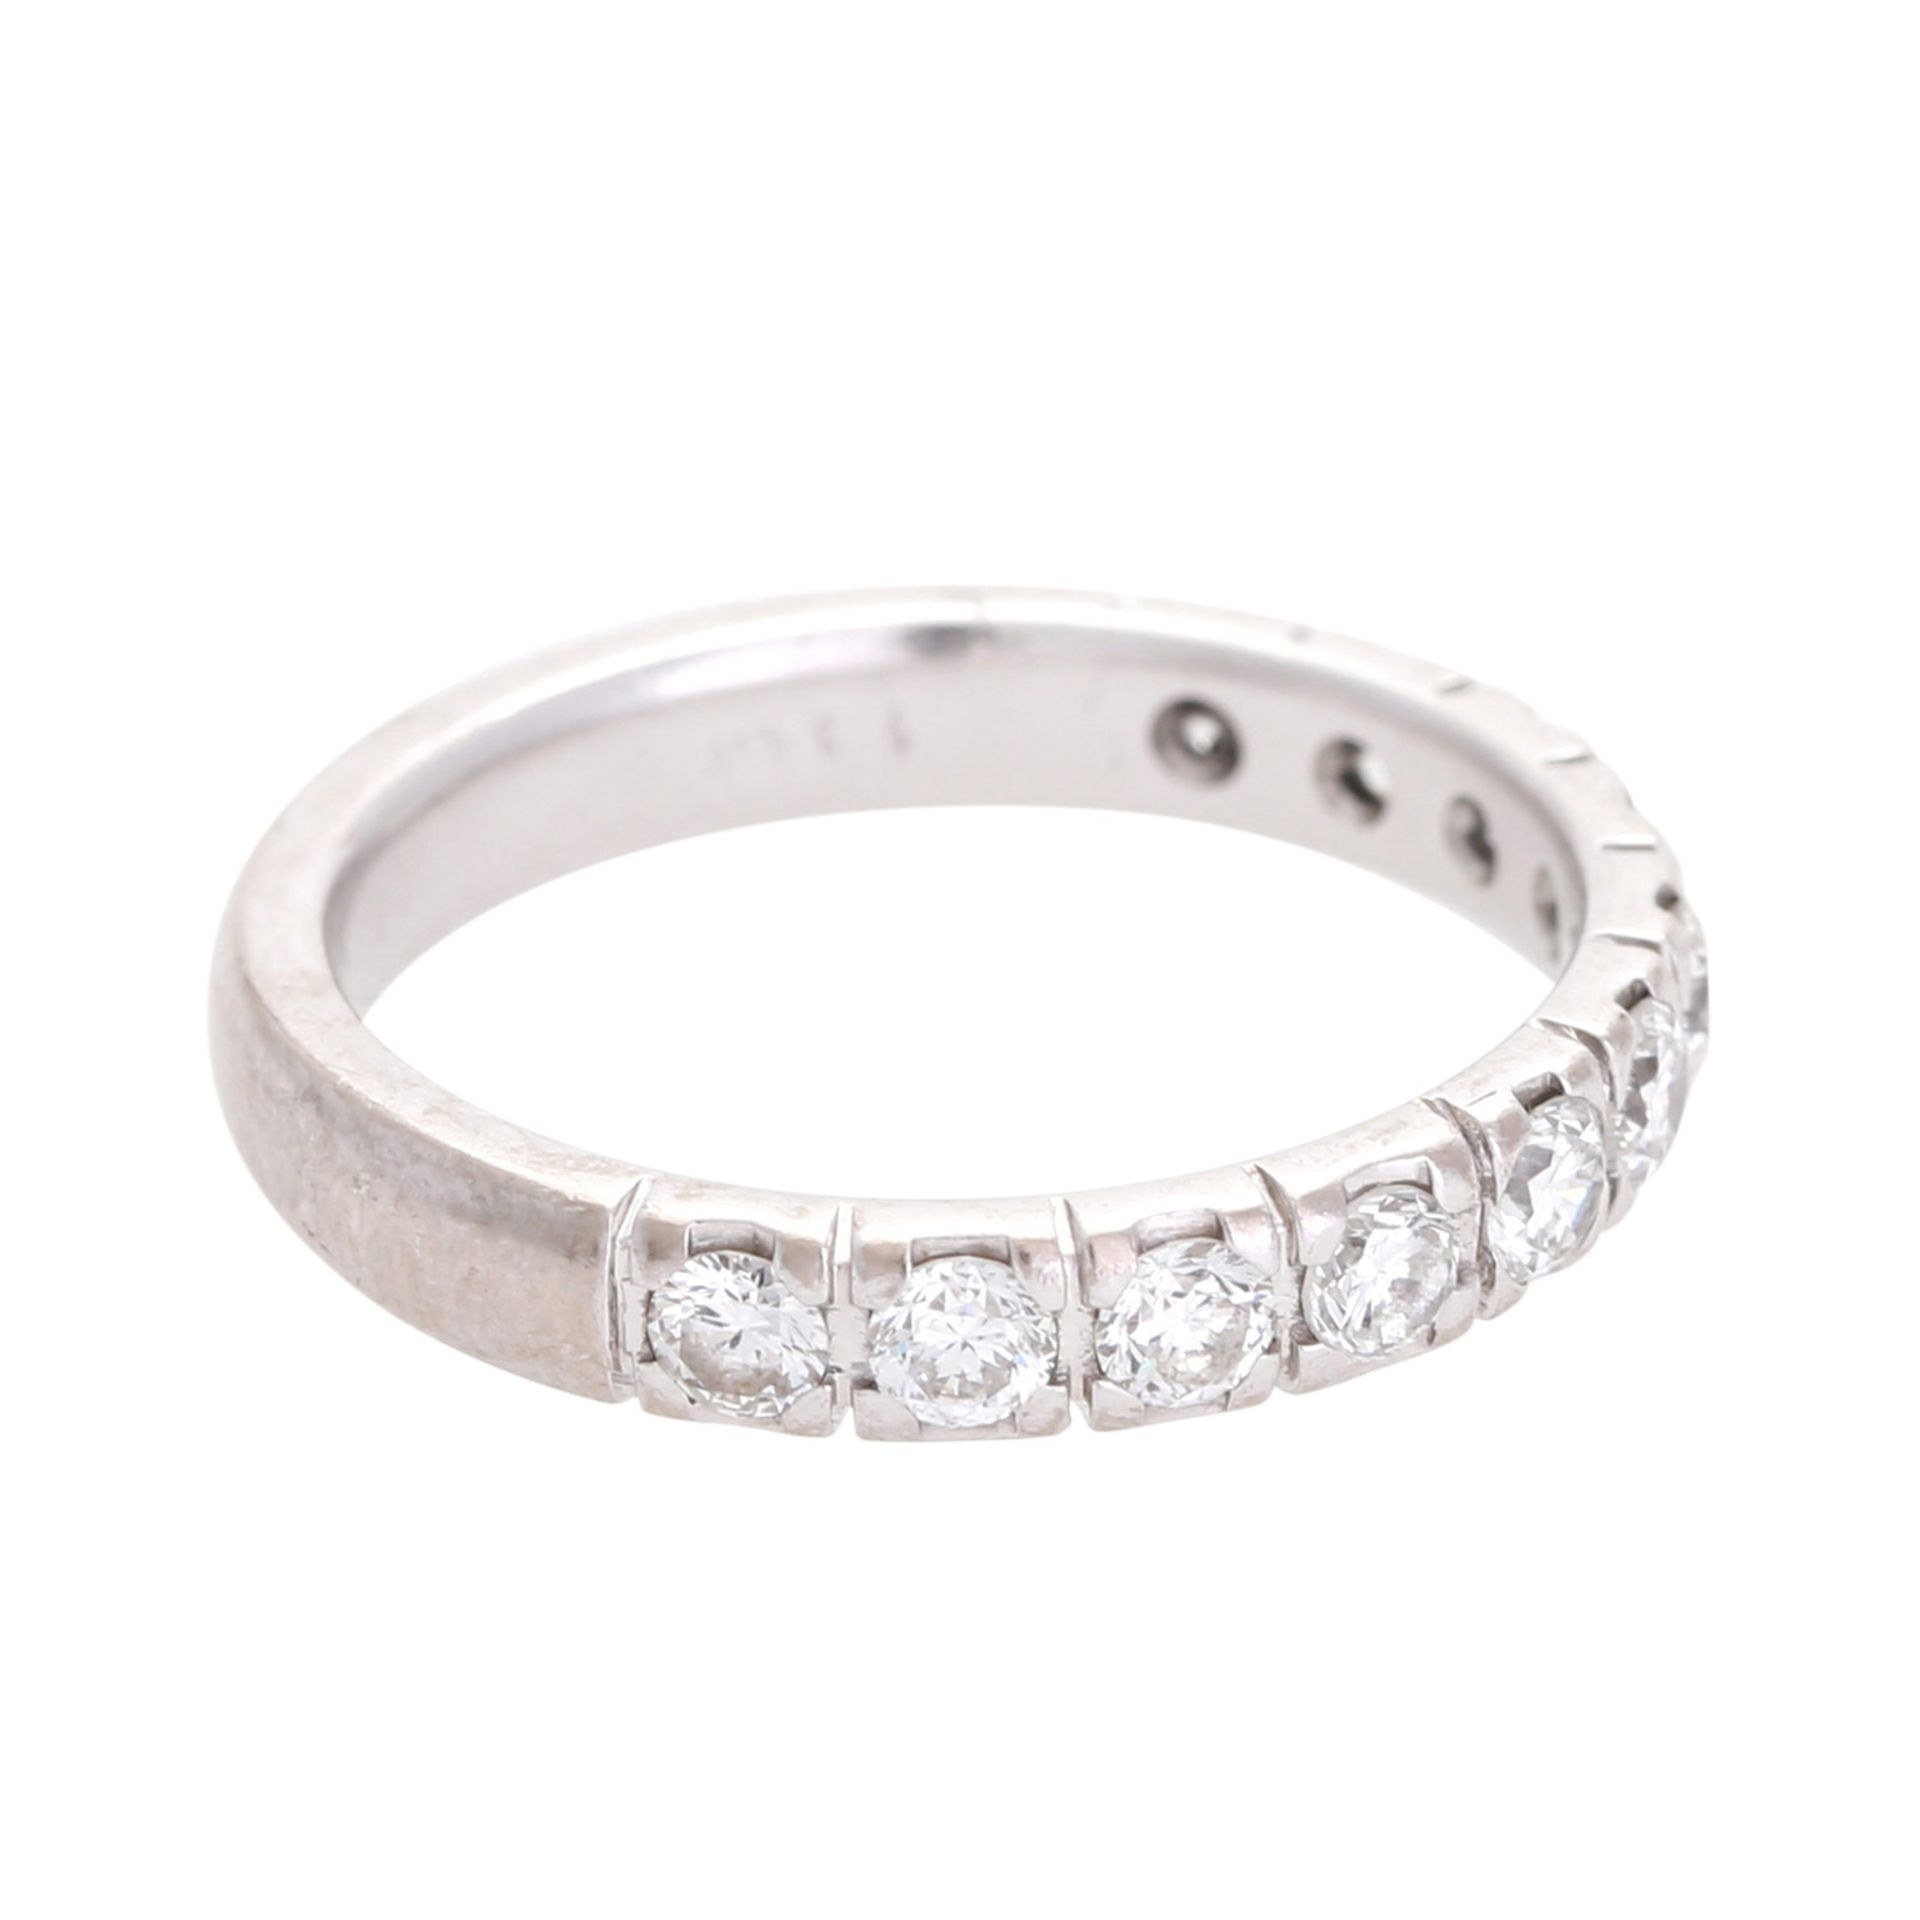 Los 138 - Halbmemoire Ring mit 11 Brillanten zus. ca. 0,80 ct. (punz.) W - LGW (H - J) / SI, WG 18K, RW: 53.